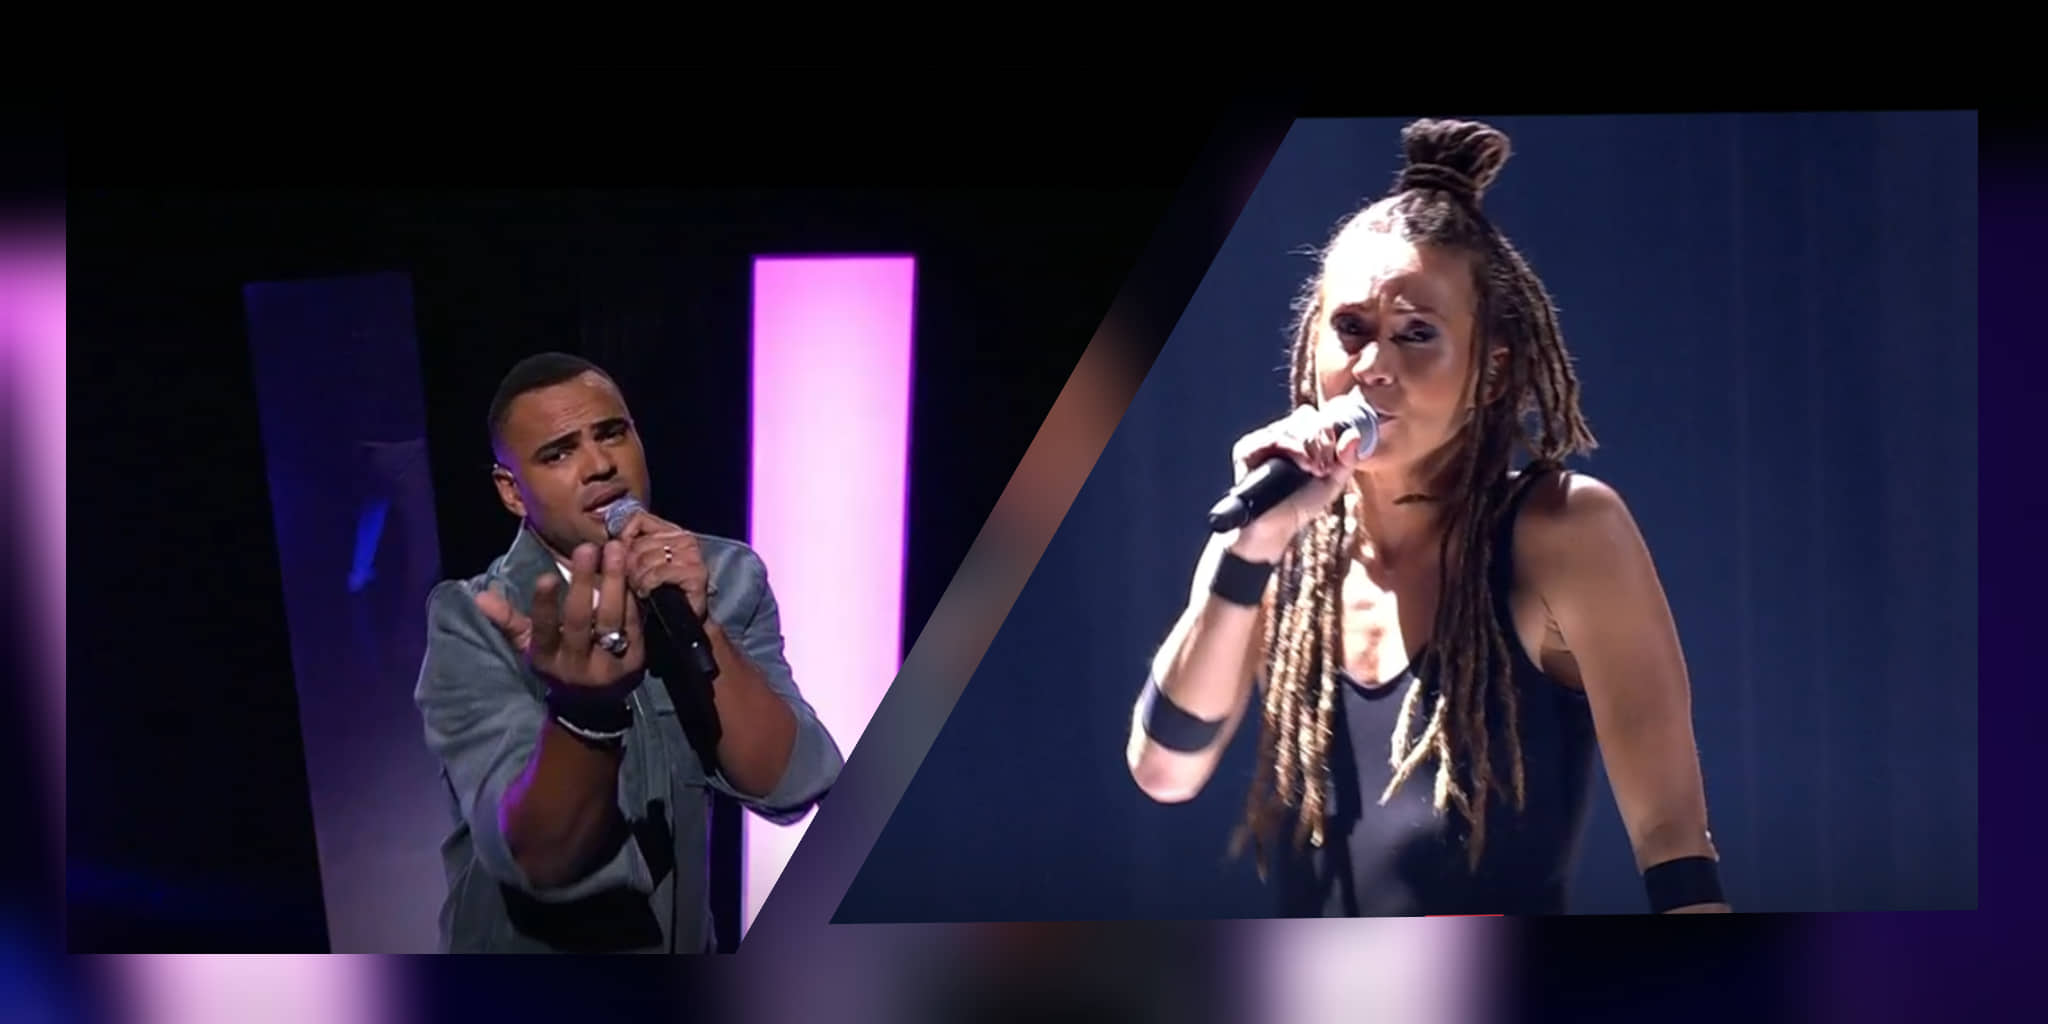 Sweden: Melodifestivalen 2020 third semi final results